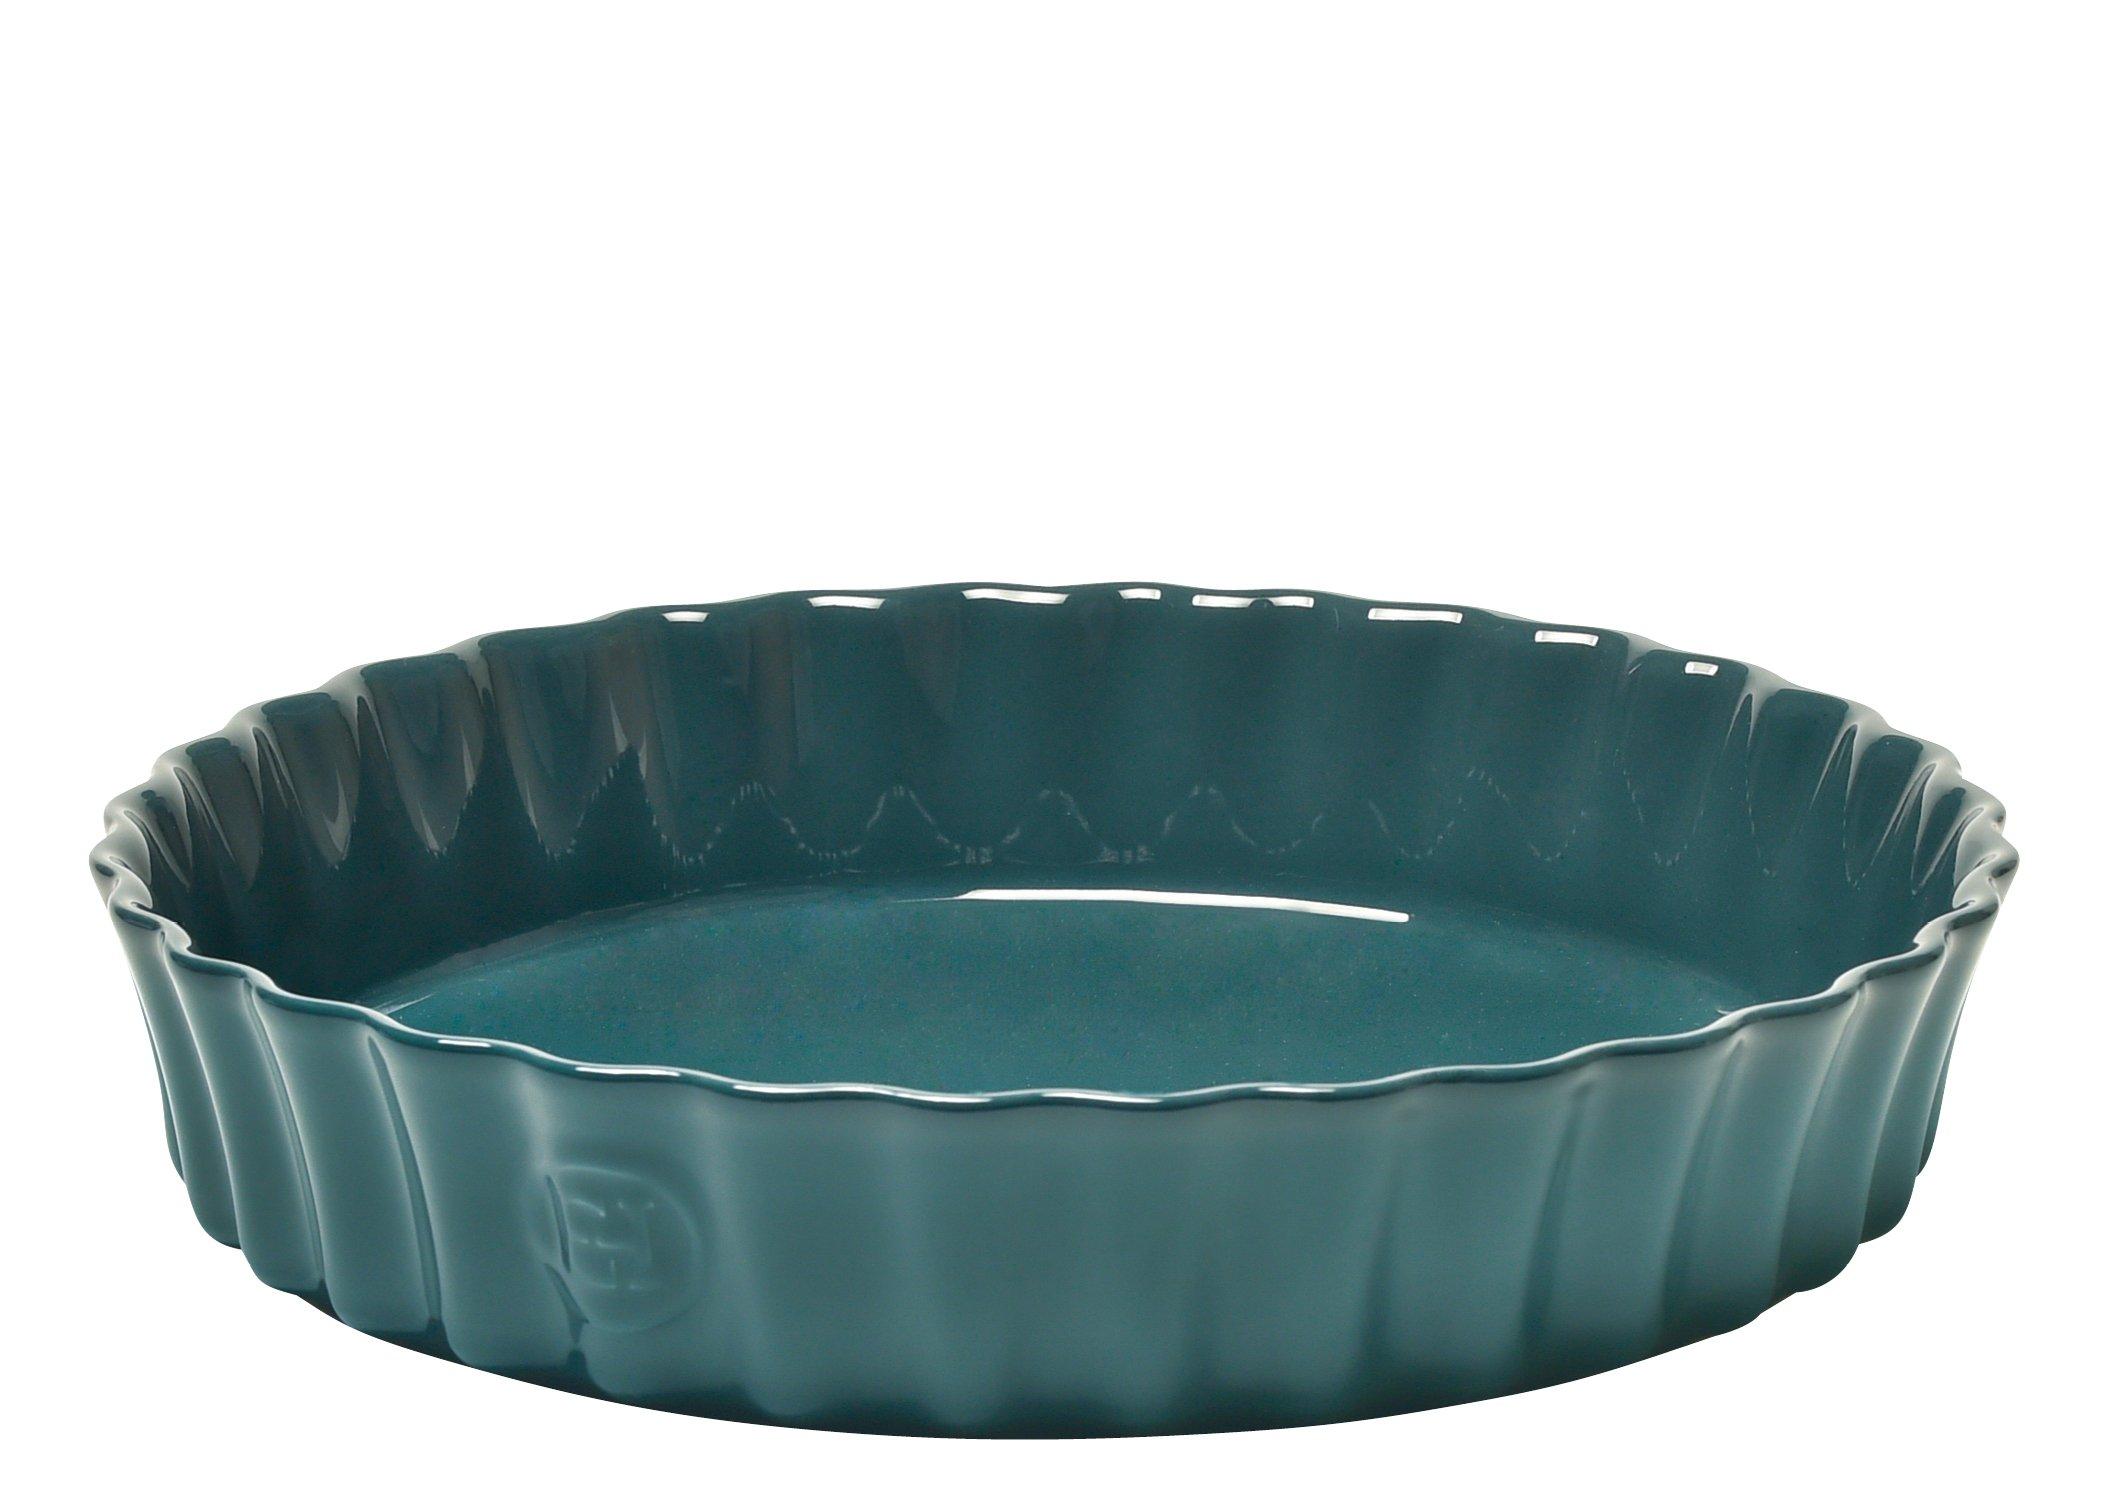 Emile Henry 976024 Deep Flan Dish, 1.2 Qt, Blue Flame